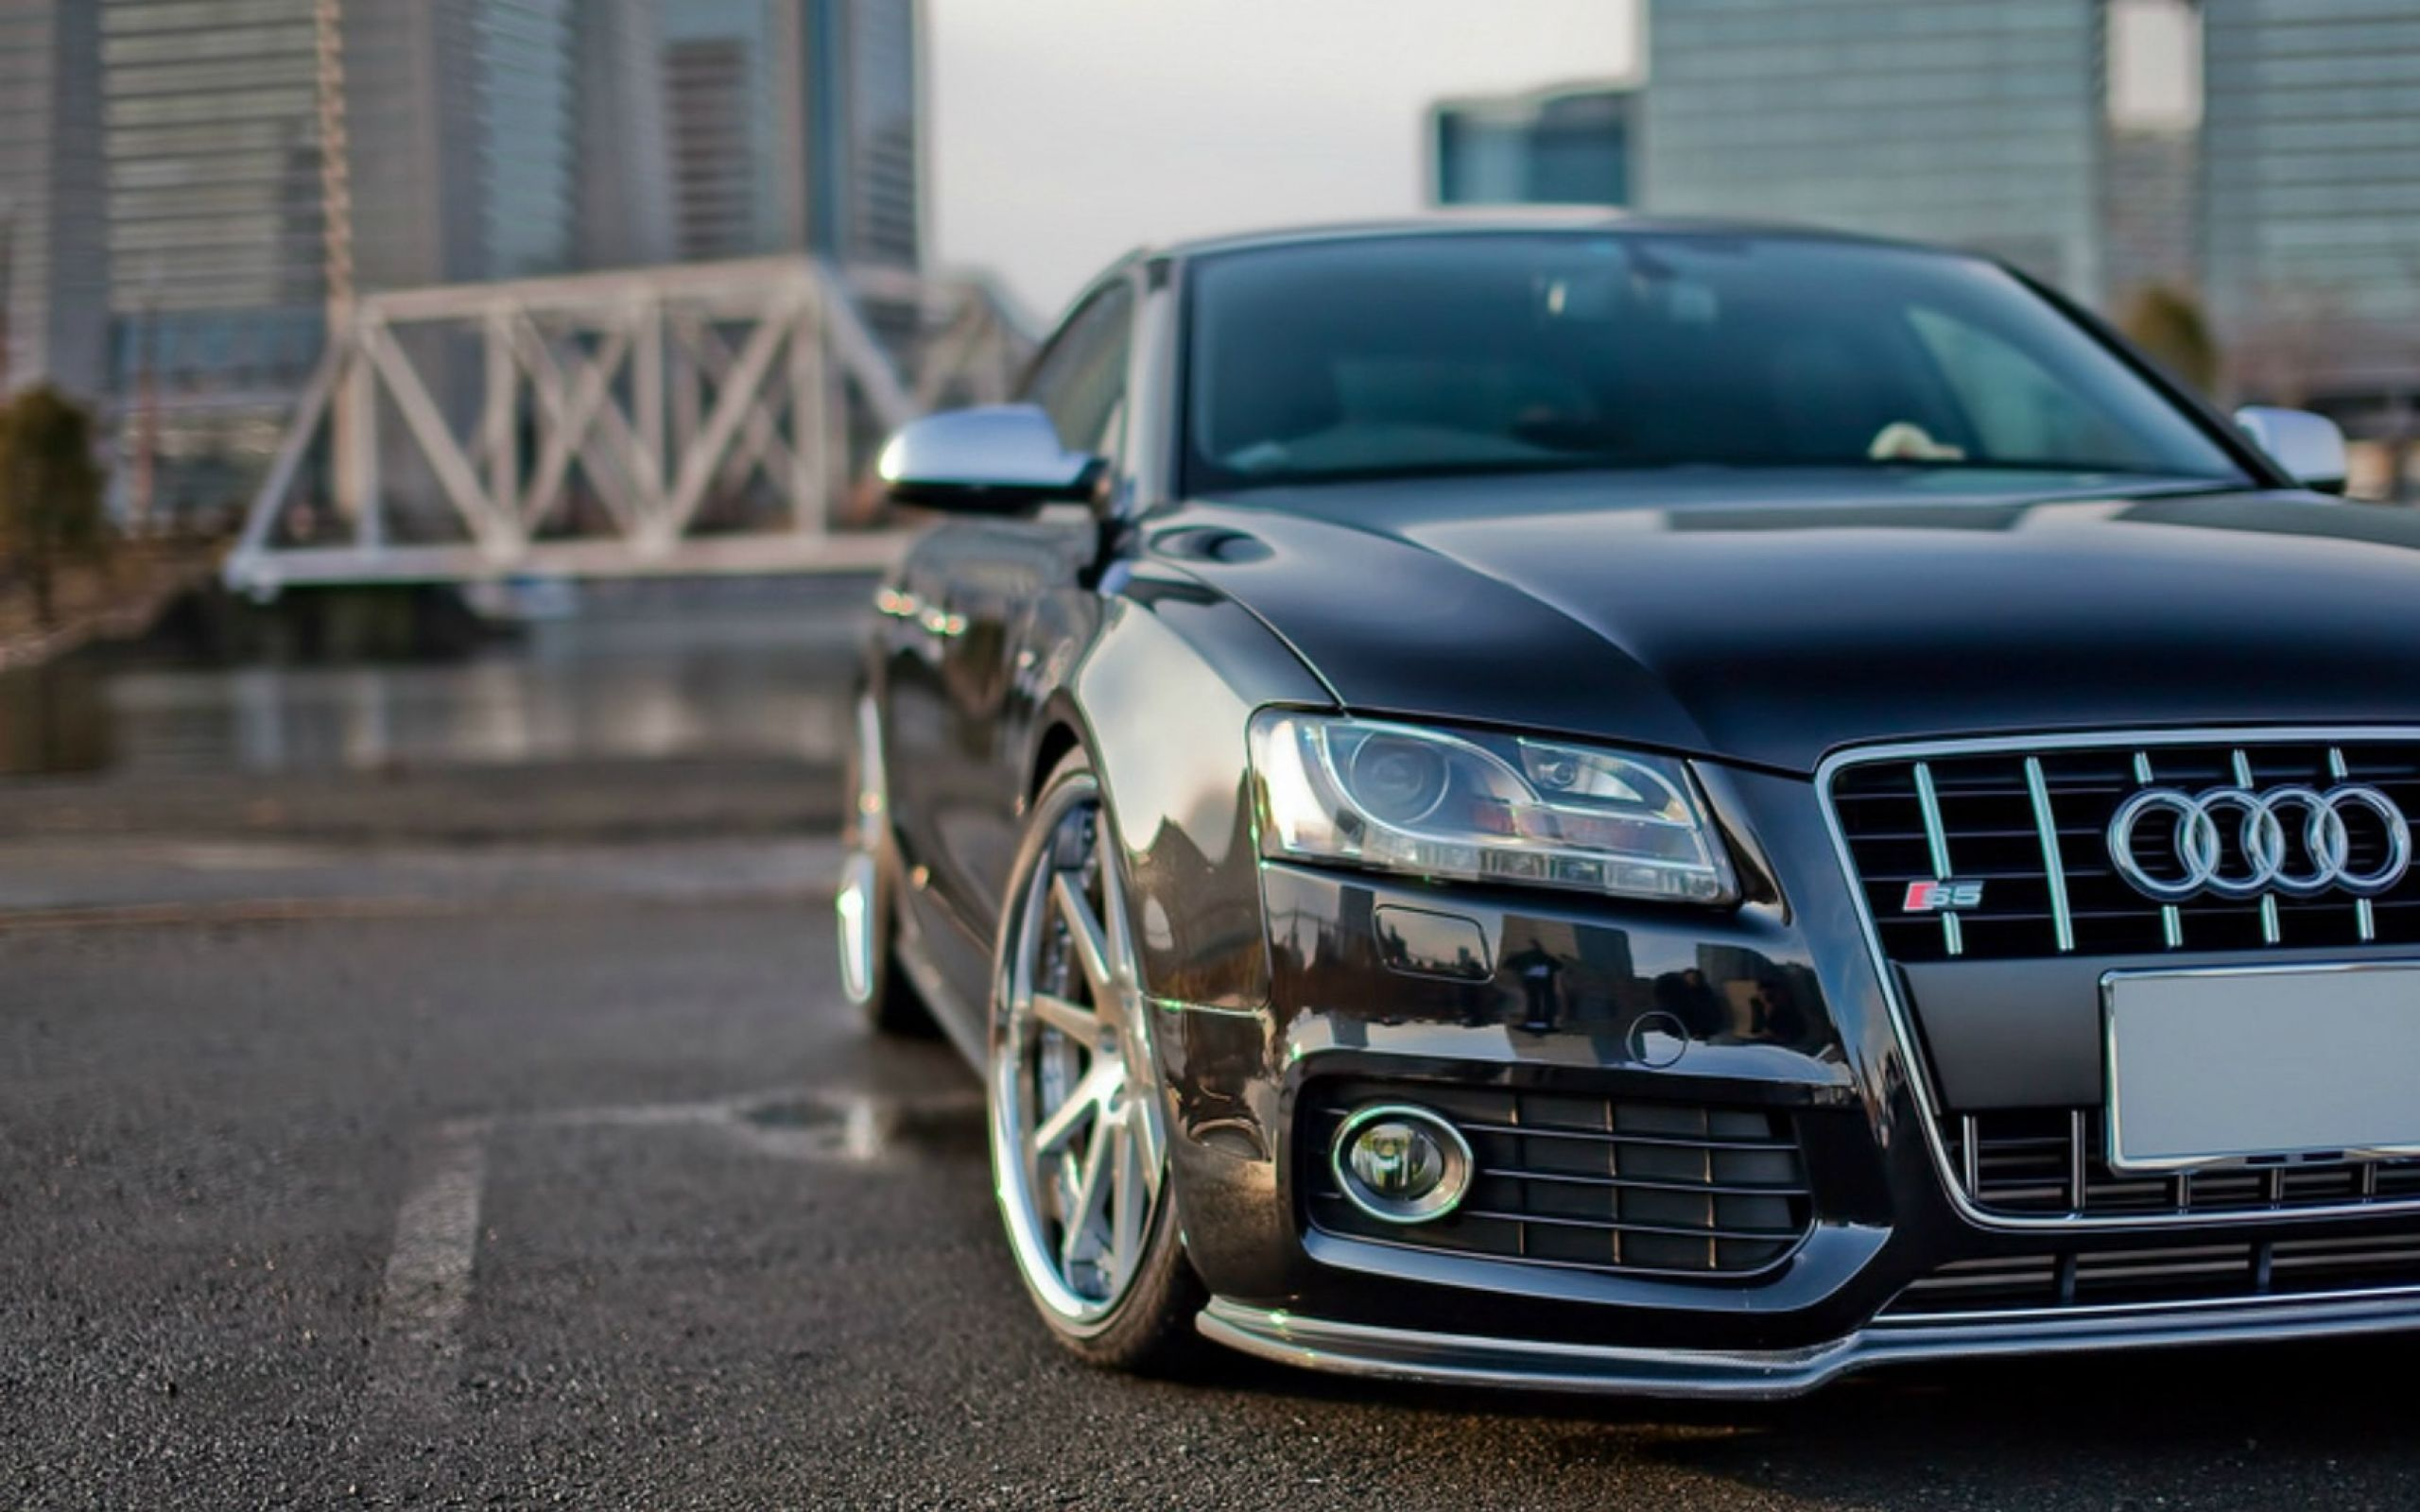 Audi Wallpapers Top Free Audi Backgrounds Wallpaperaccess